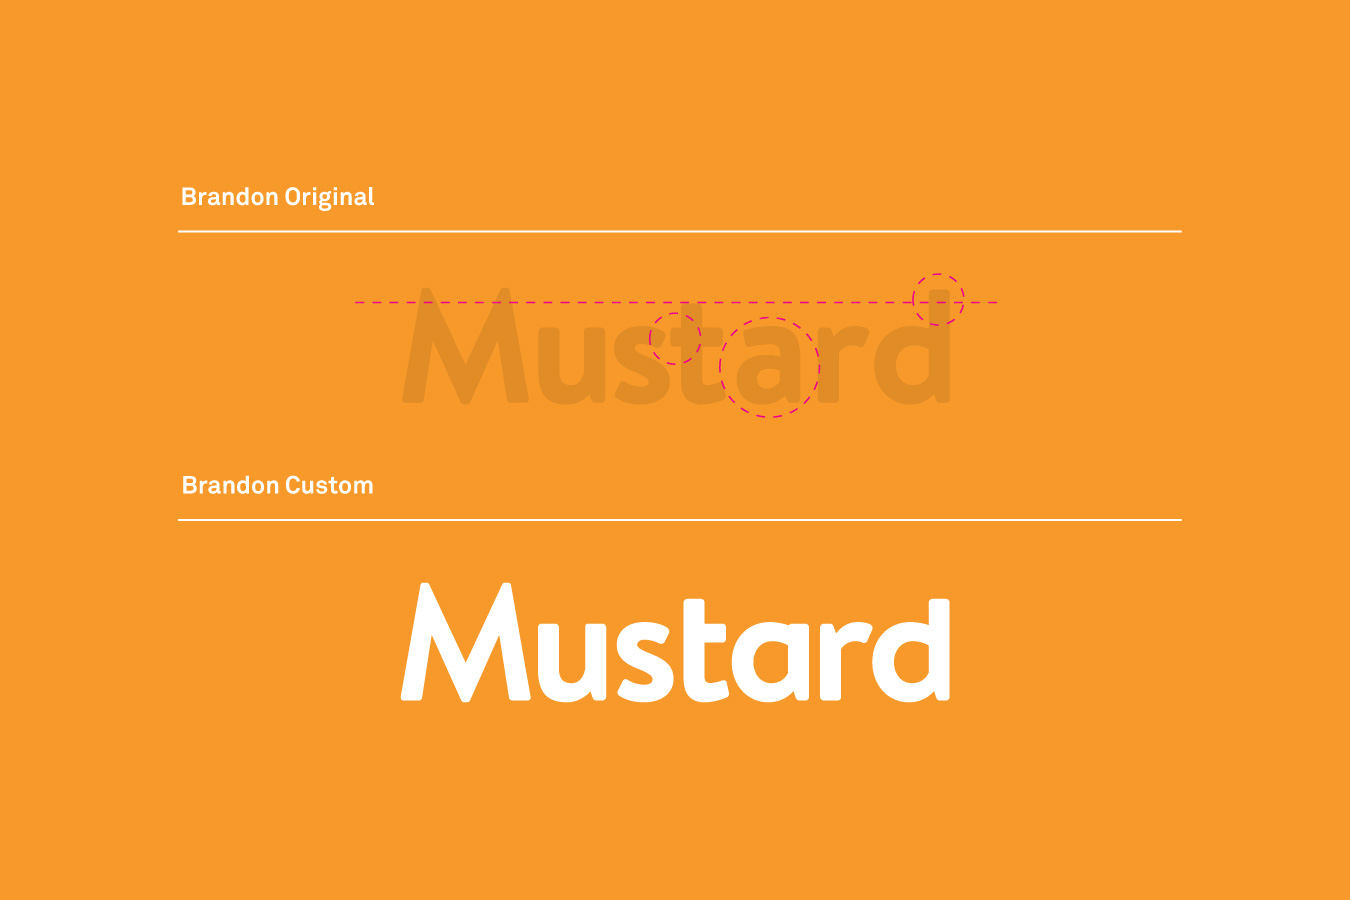 mustard-business-advisory-hdd-2